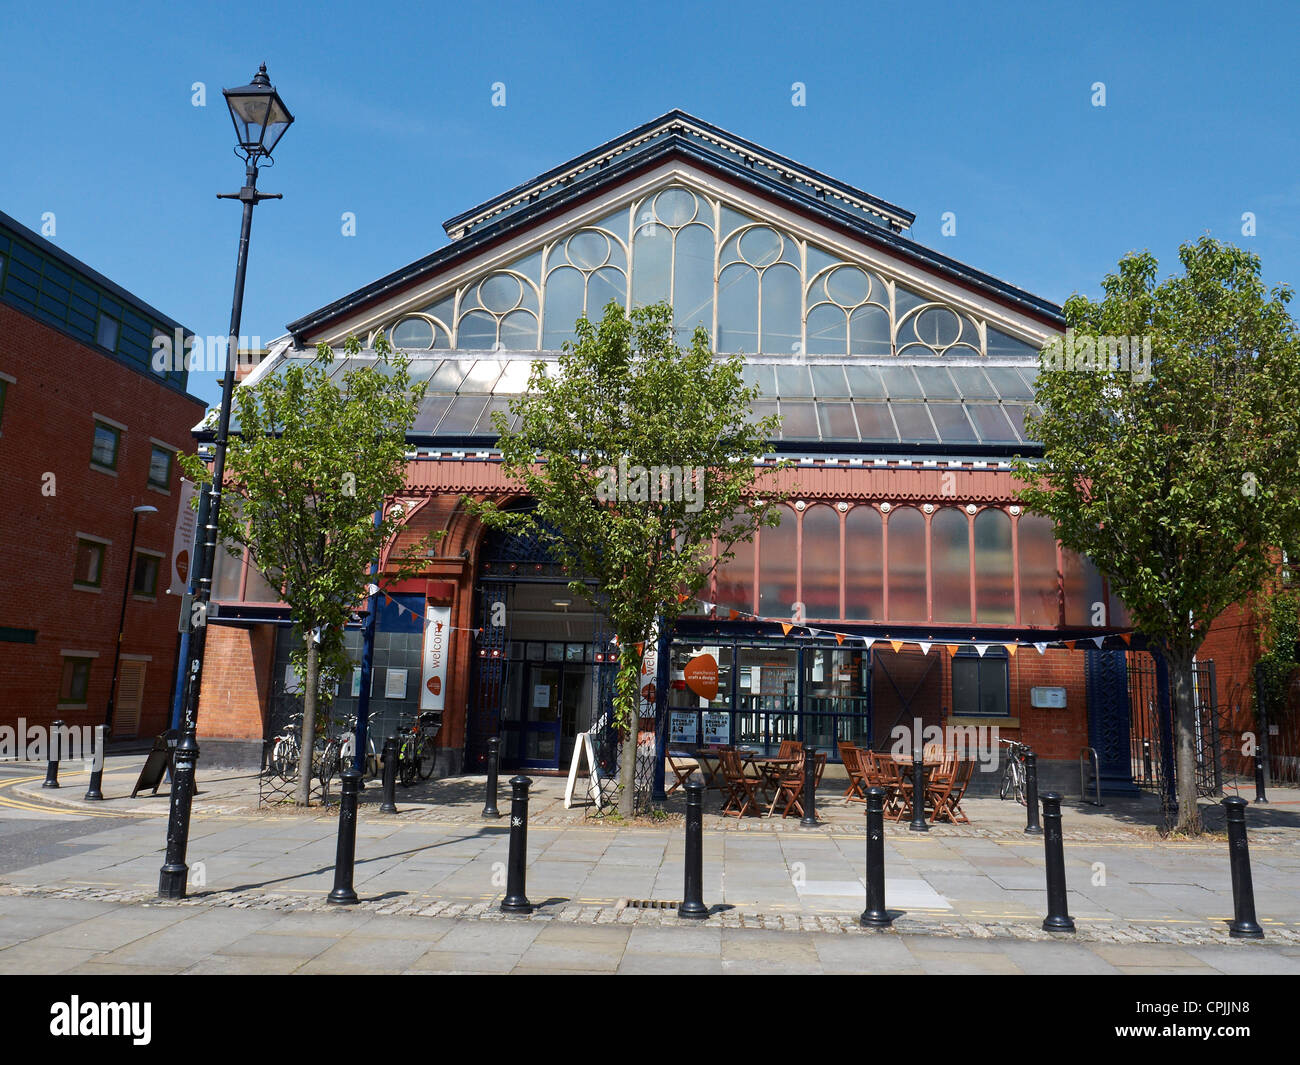 Manchester Craft & Design Centre, Manchester UK - Stock Image